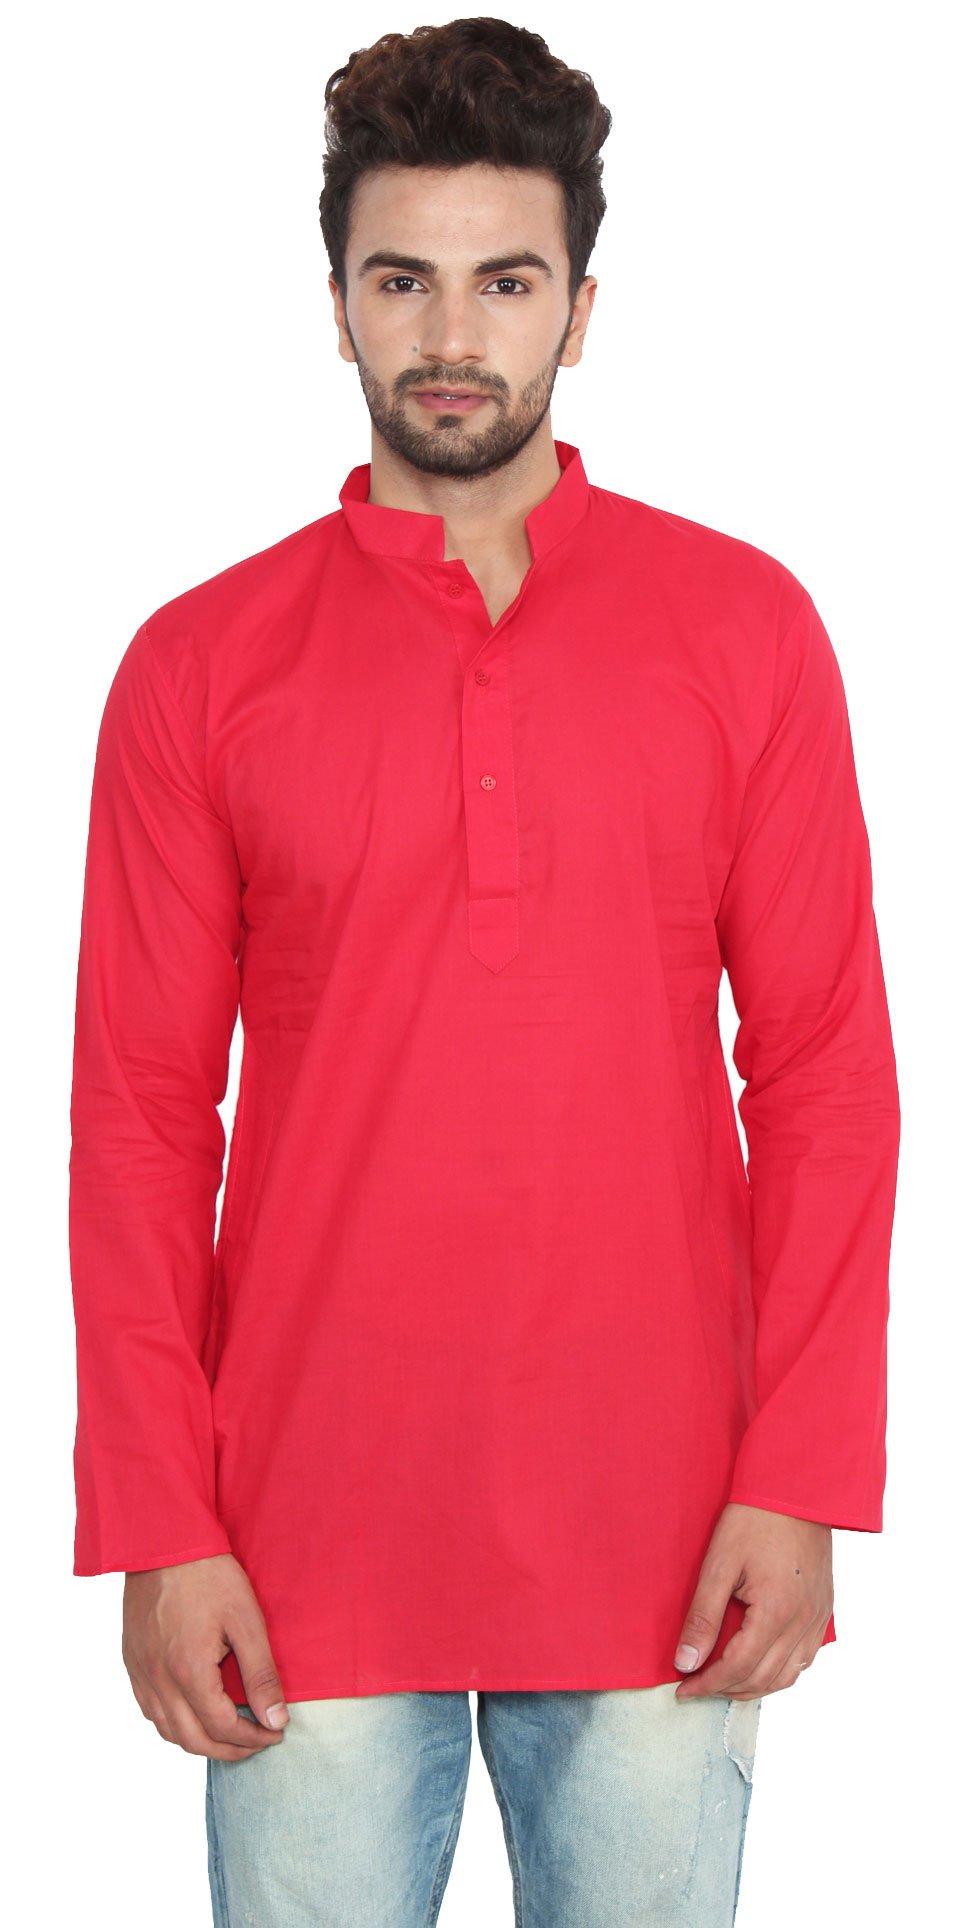 Cotton Dress Mens Short Kurta Shirt India Fashion Clothes (Red, M)